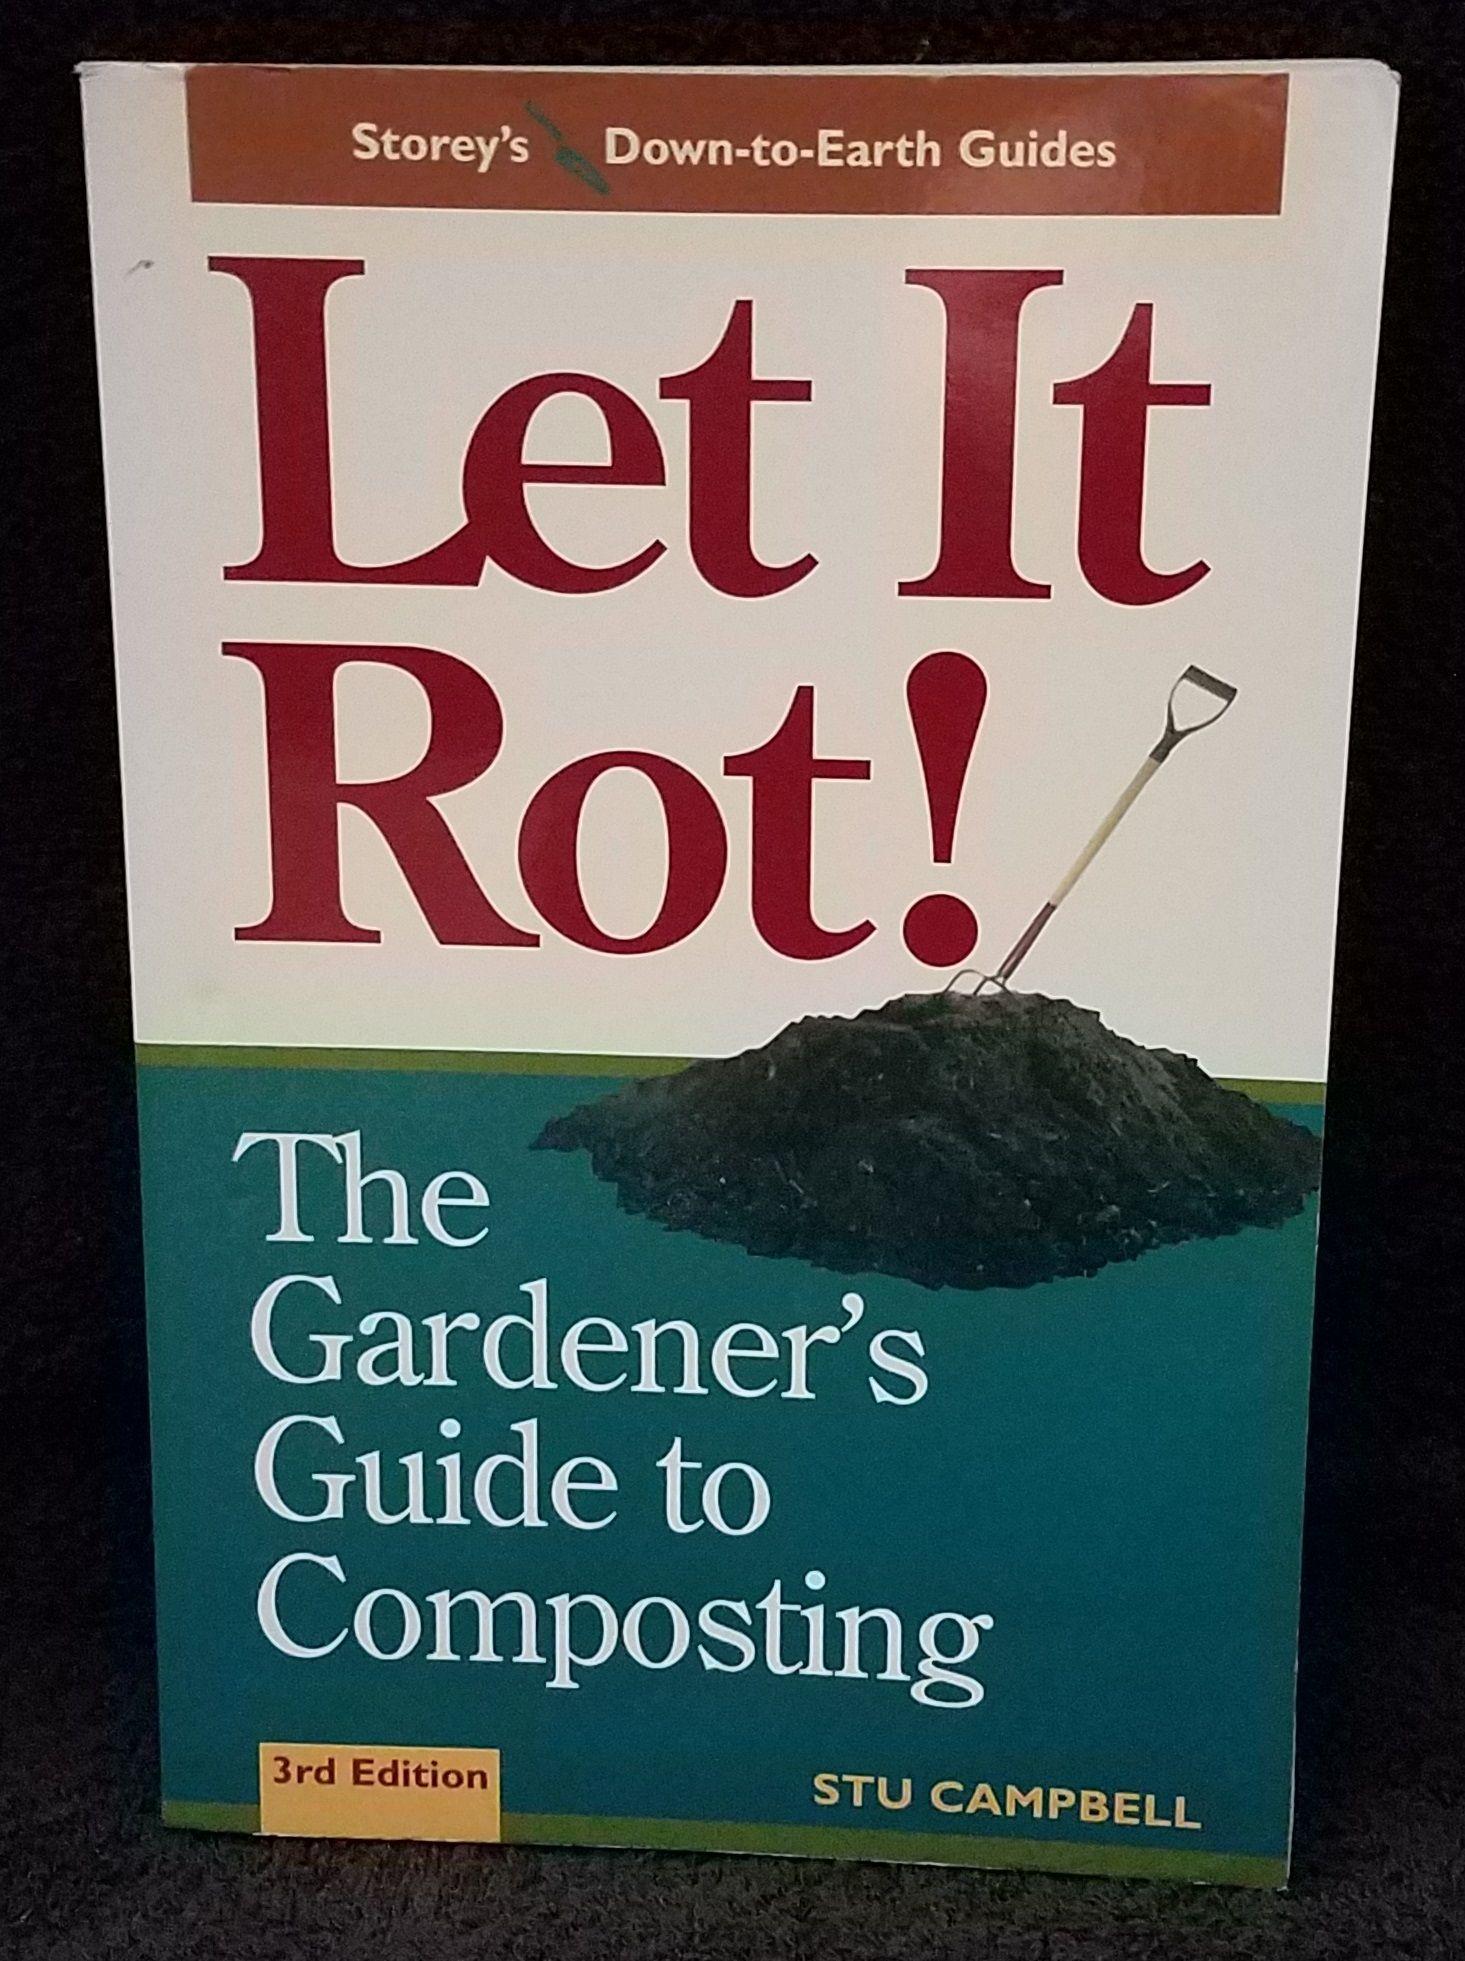 81e9ab43212349ea8692b3515a7769da - Let It Rot The Gardener's Guide To Composting